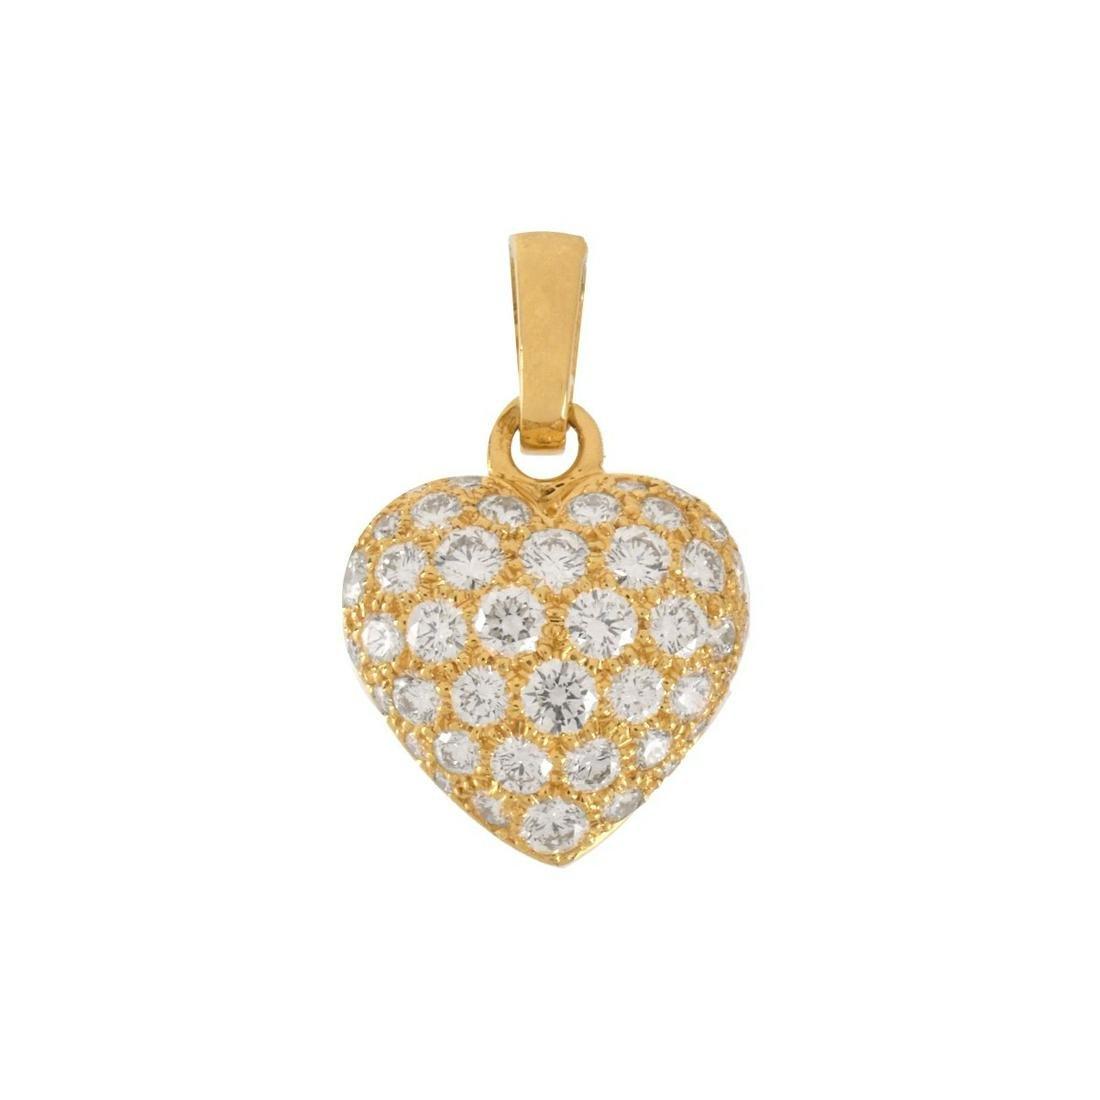 Cartier Diamond and 18K Heart Pendant